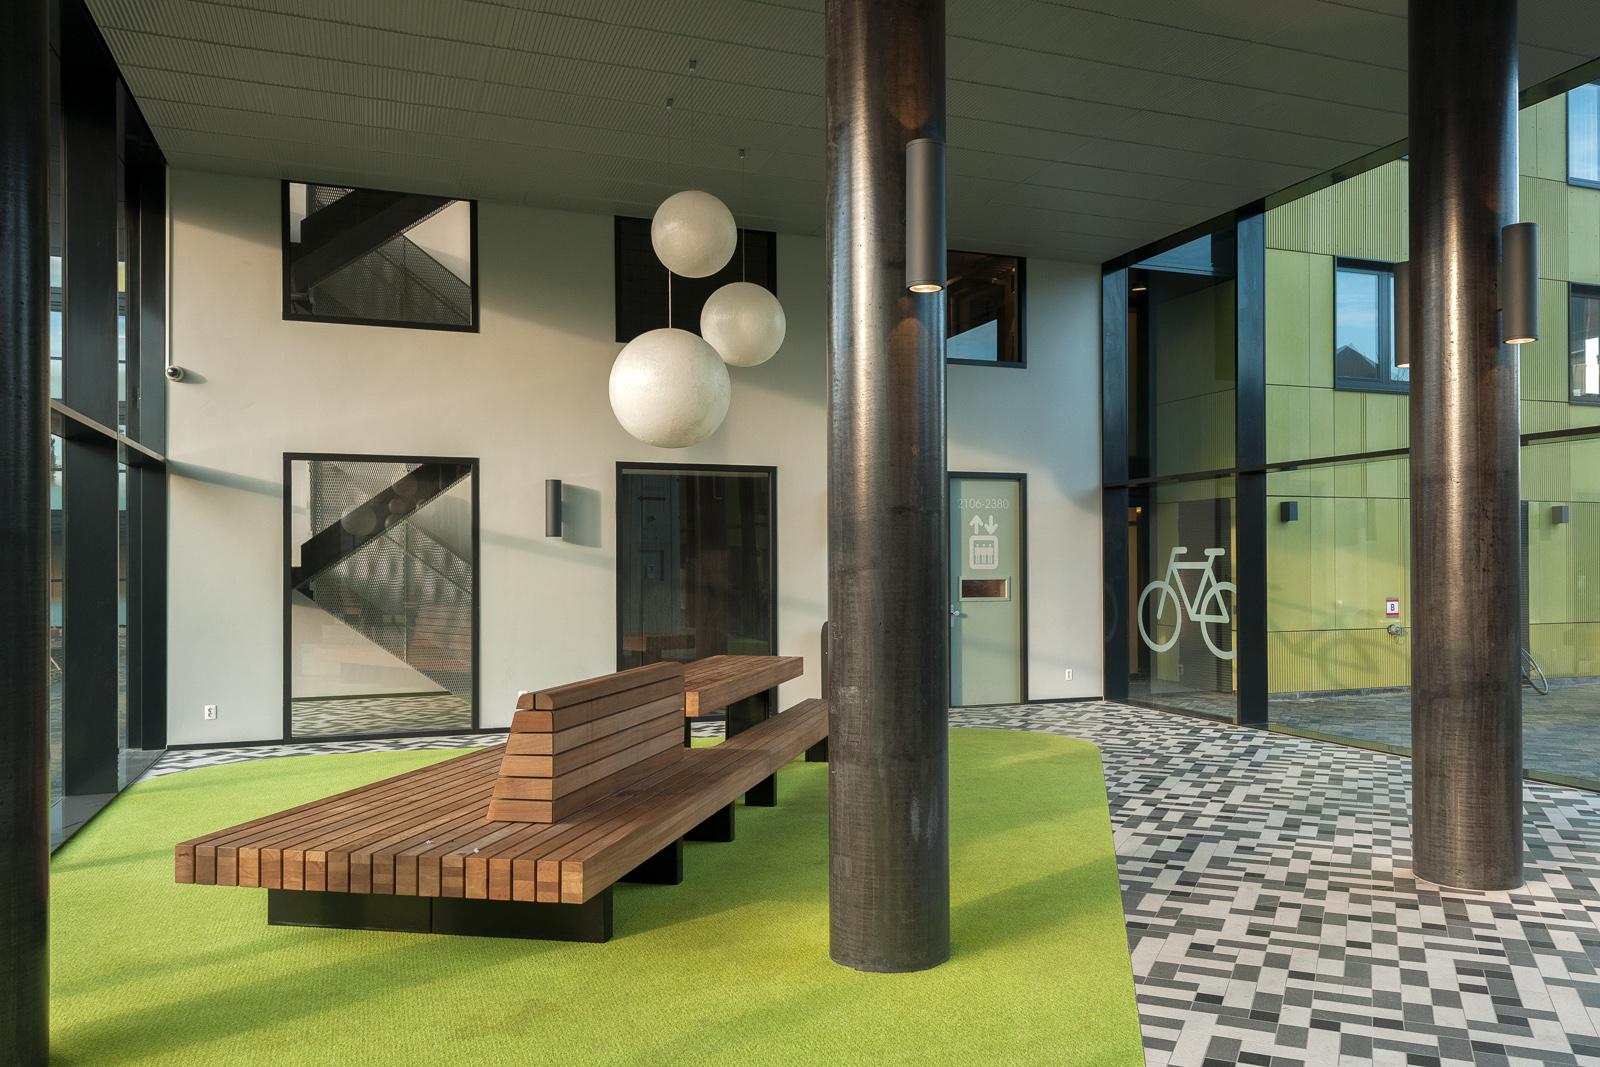 Studenten huisvesting science park amsterdam for Interieur architectuur